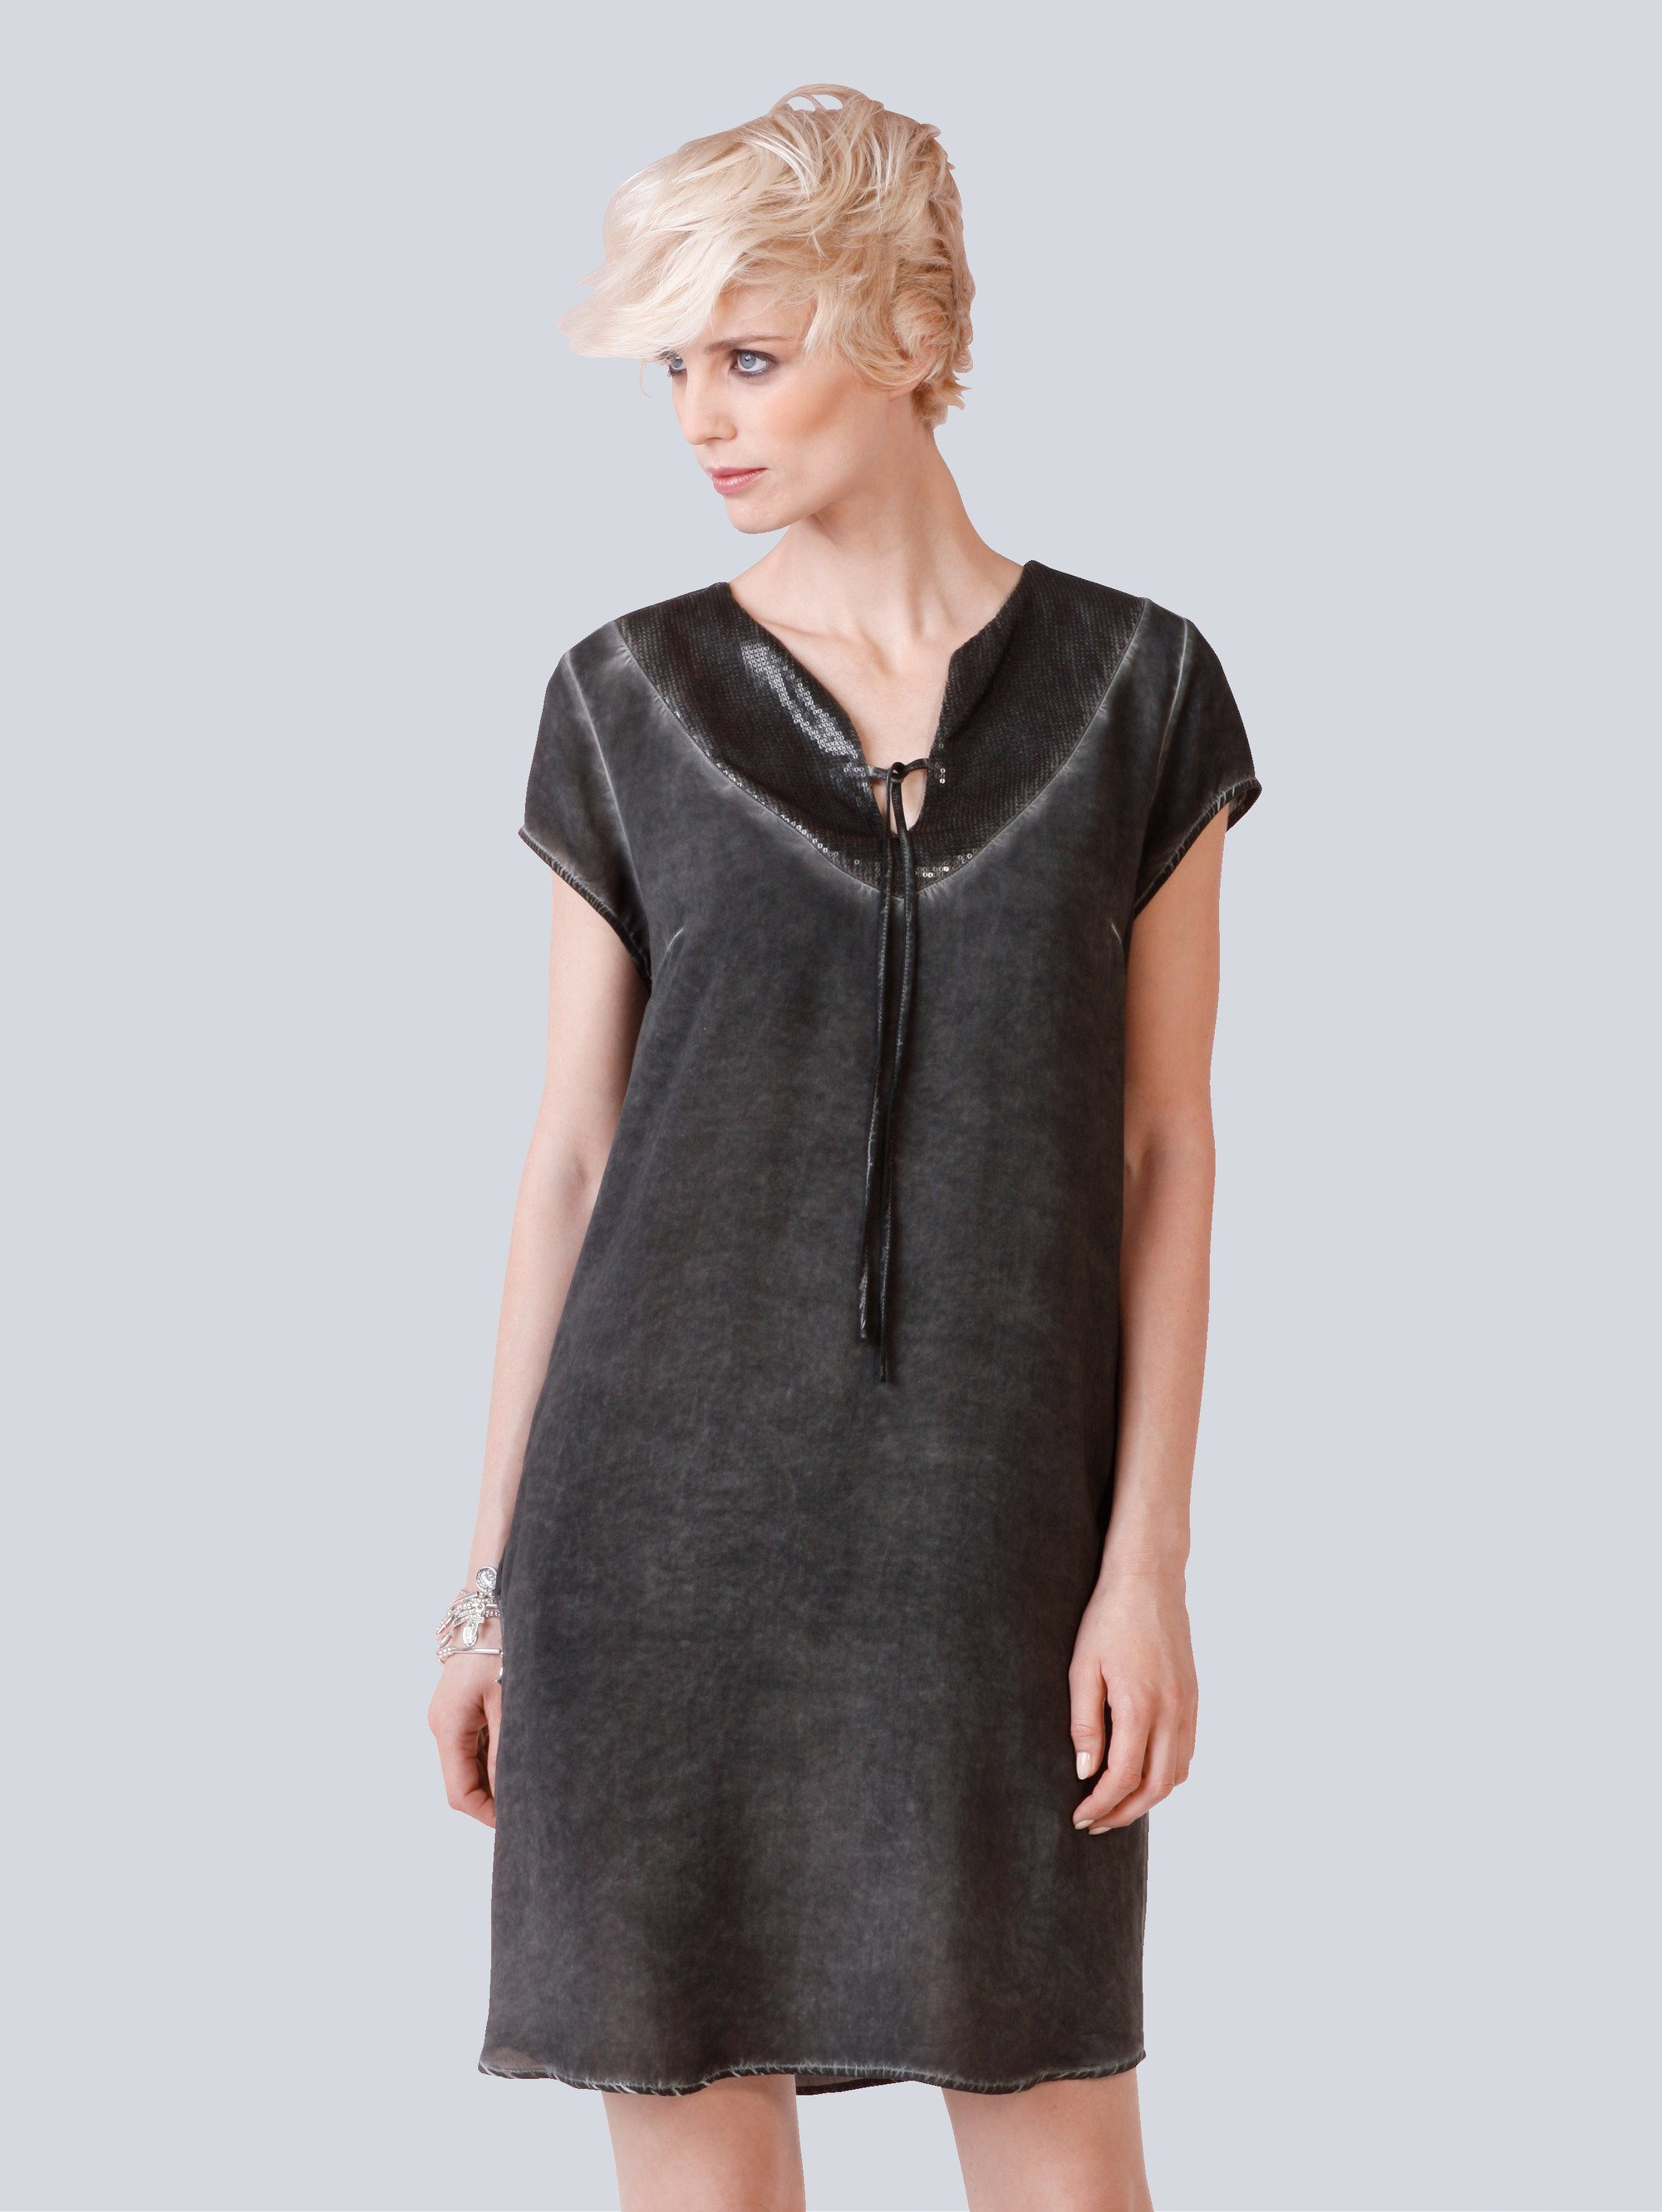 Vero moda kleid schwarz tull